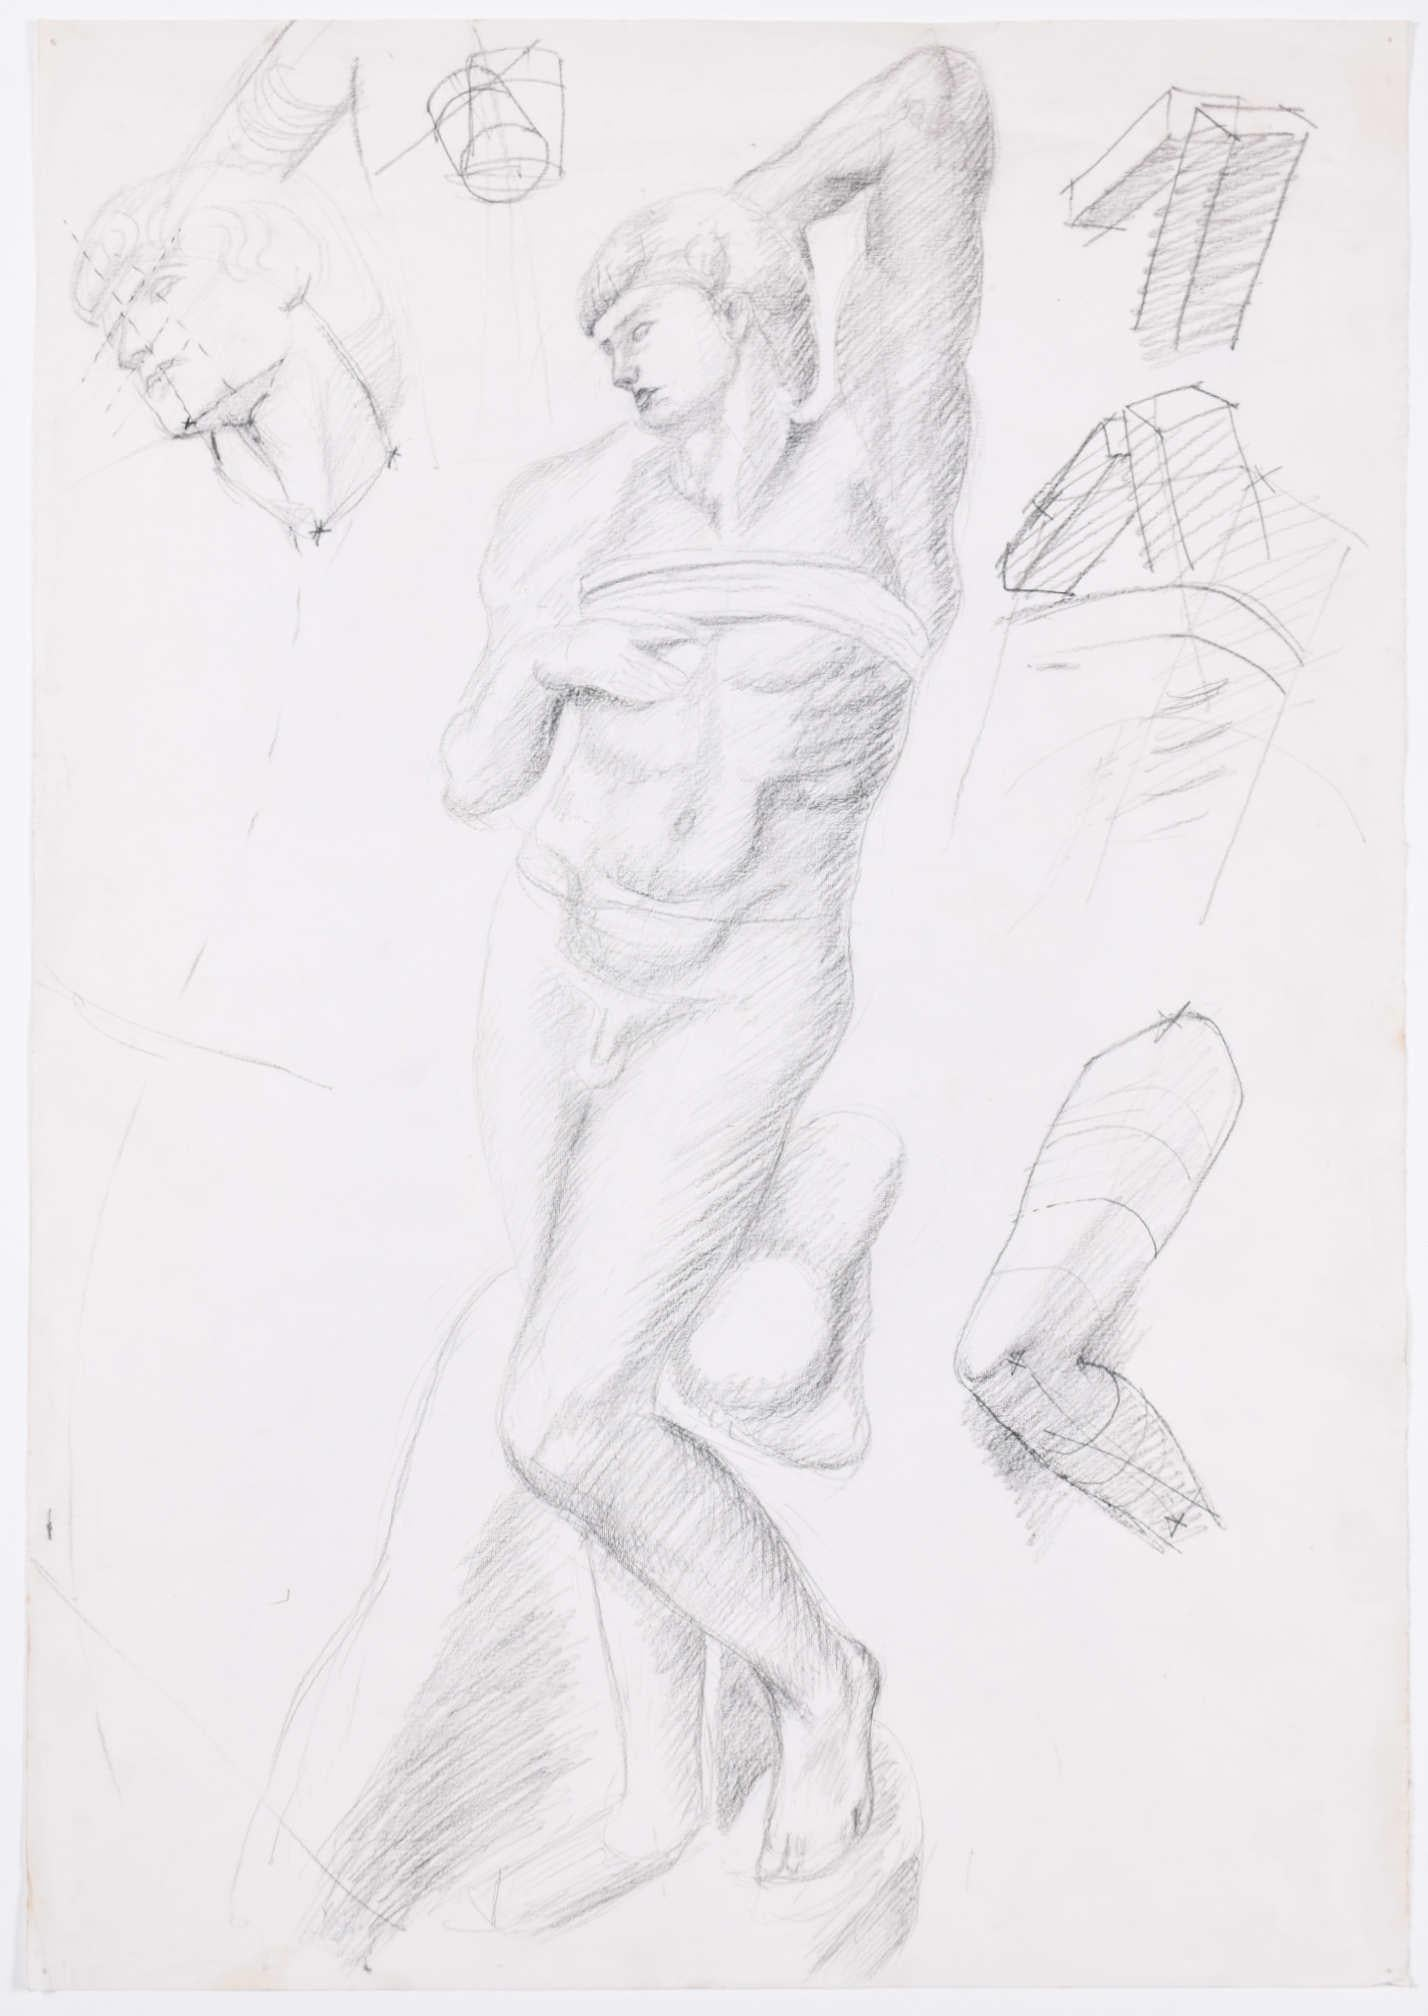 Sketches of a figure: Hilary Hennes Miller c.1940 English Modern British Art